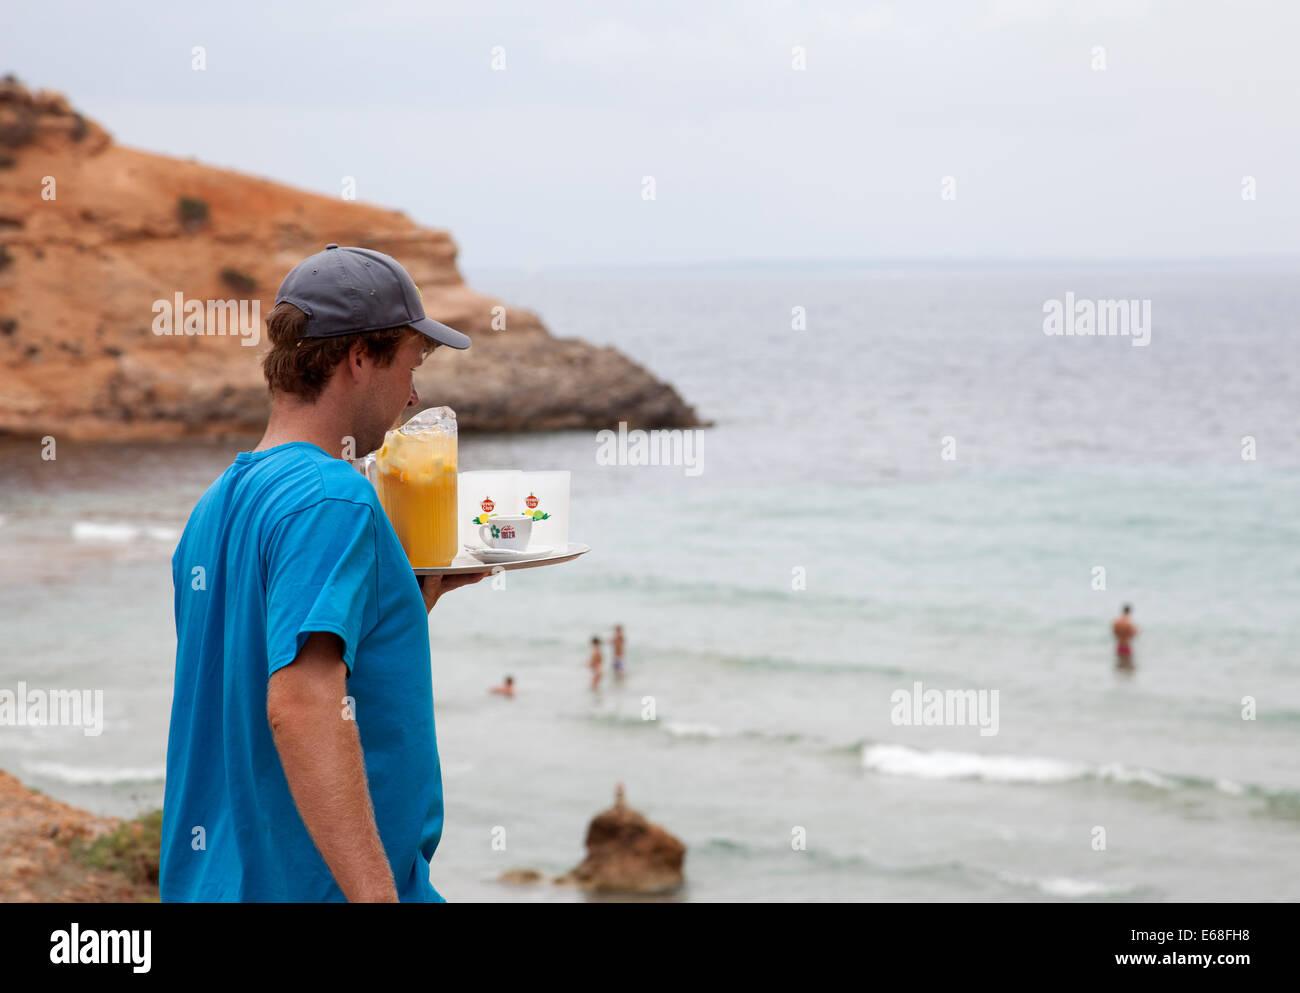 Waiter Taking Jug of Drinks onto Sa Caleta Beach in Ibiza - Stock Image